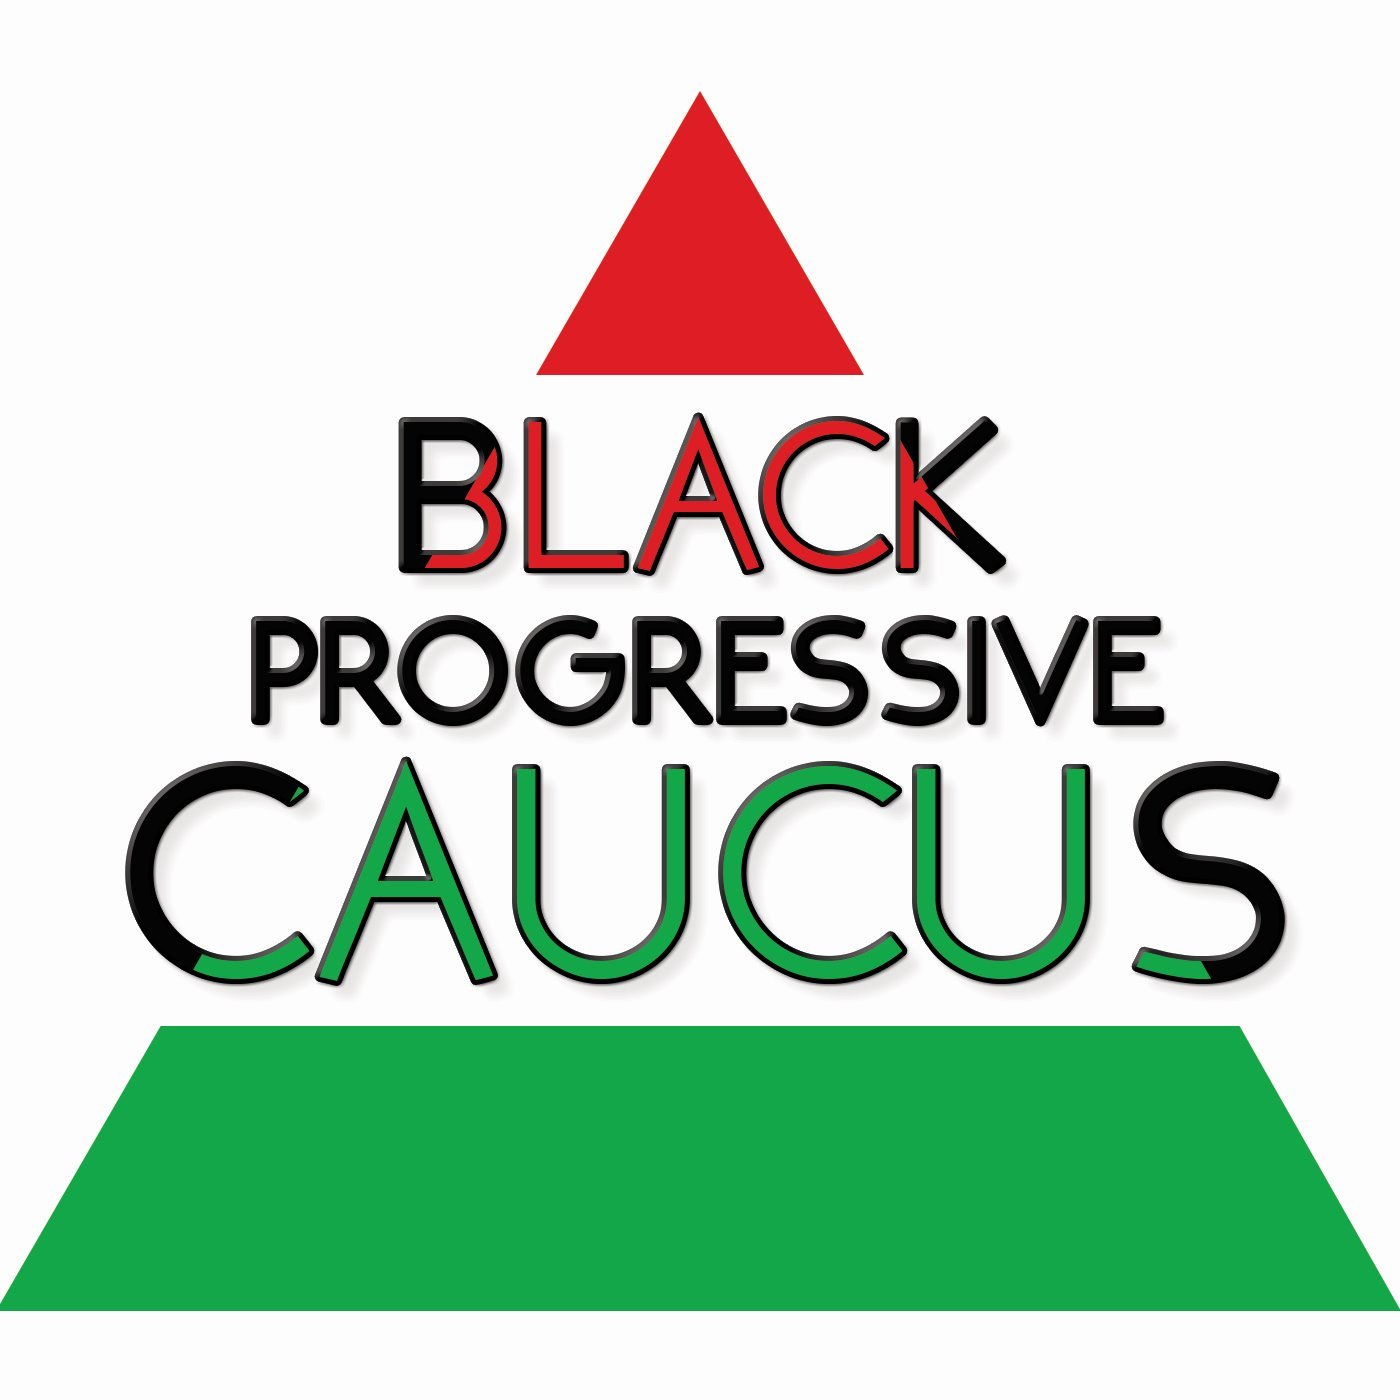 BlackProgressiveCaucus